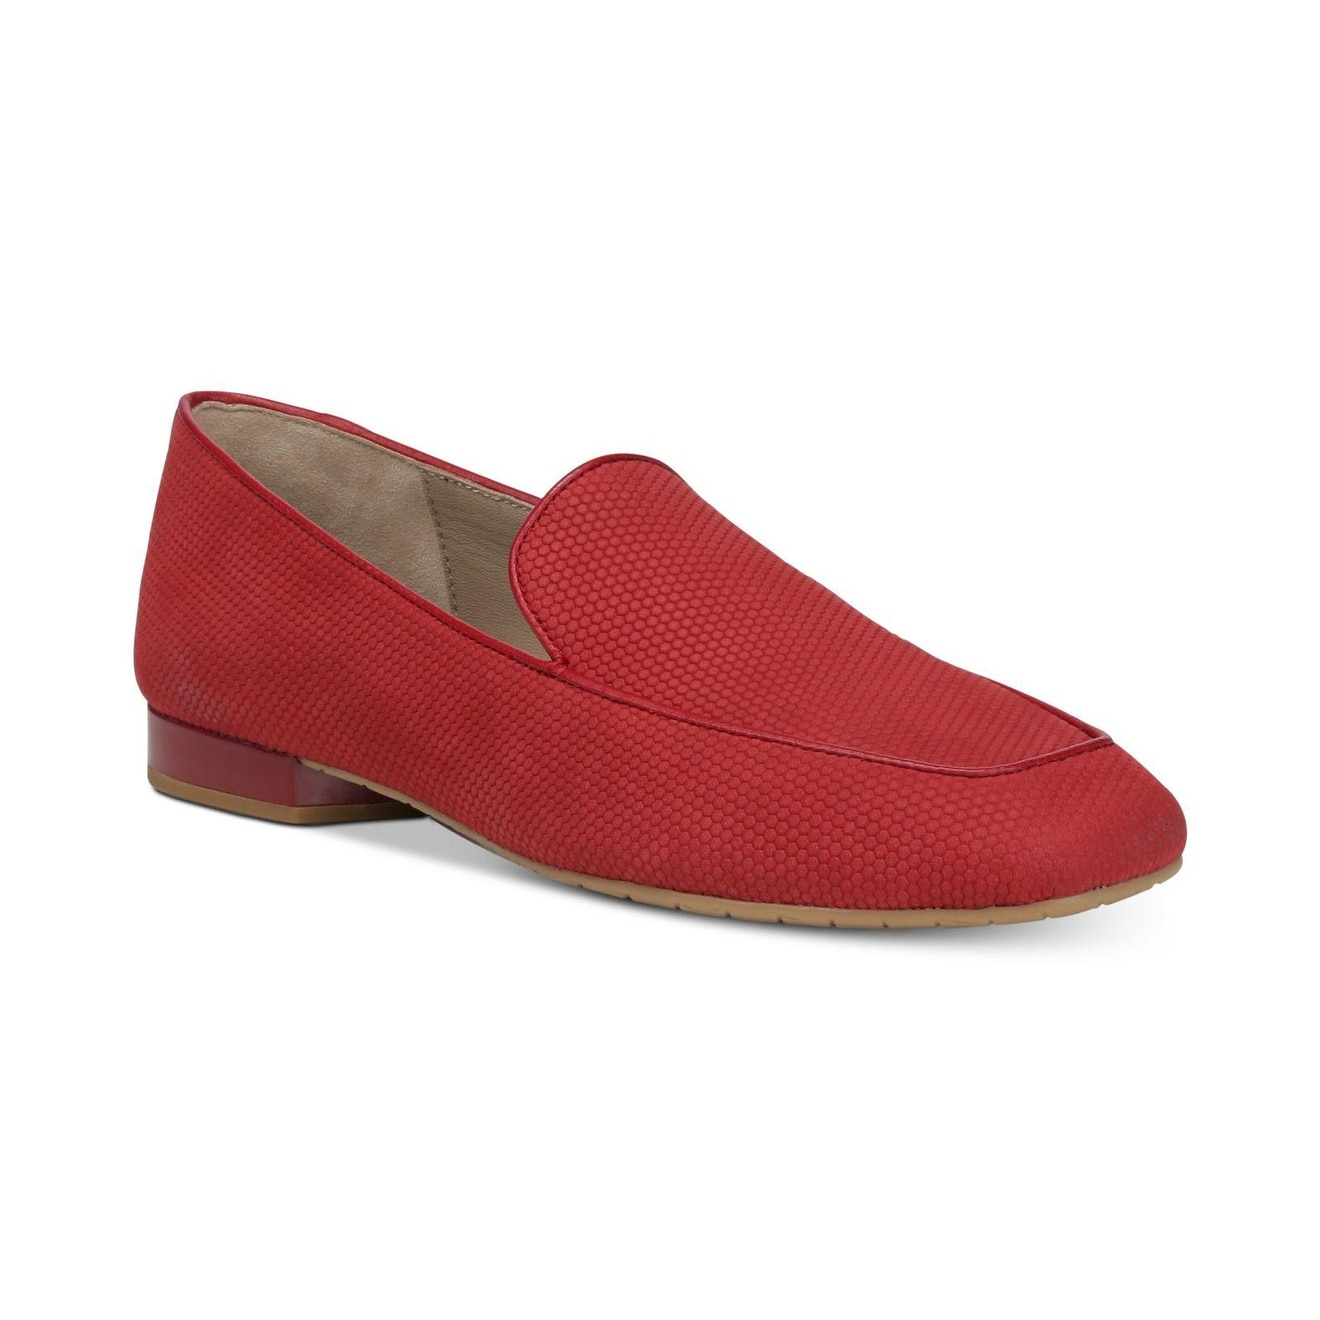 Pliner Womens Honey Slip On Loafers Shoes BHFO 7808 Donald J